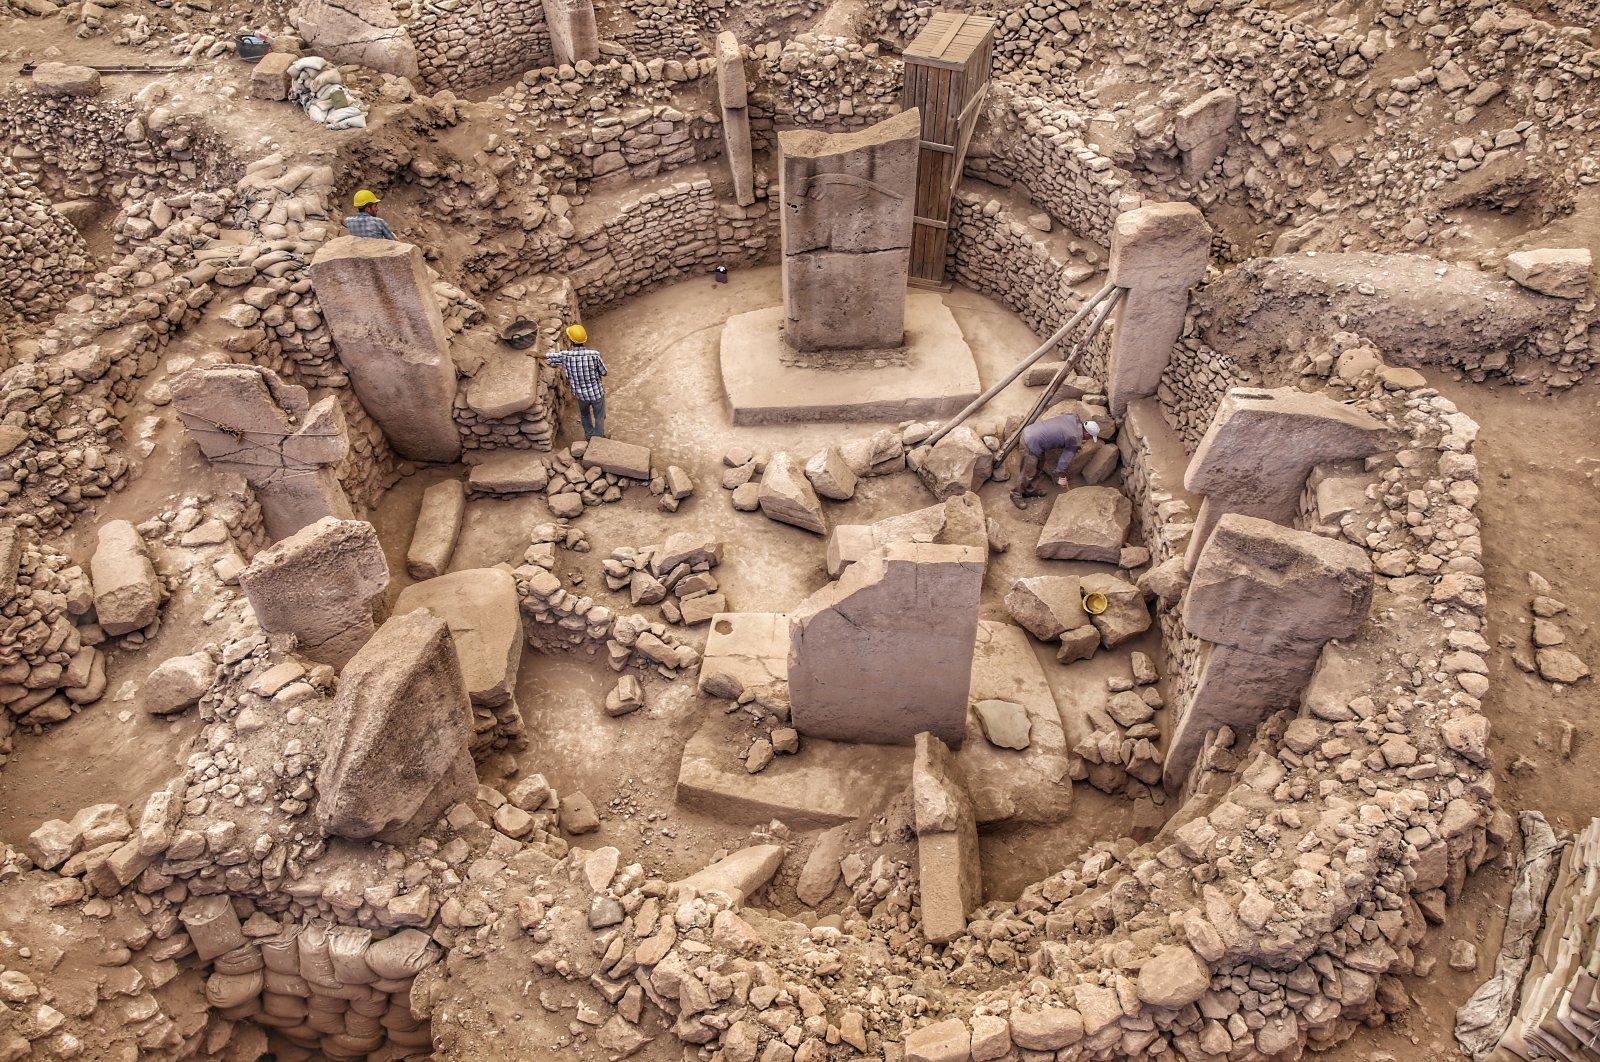 The ancient ruins of Göbeklitepe in Şanlıurfa, southeastern Turkey, Nov. 27, 2019. (PHOTO BY MURAT ŞENGÜL)